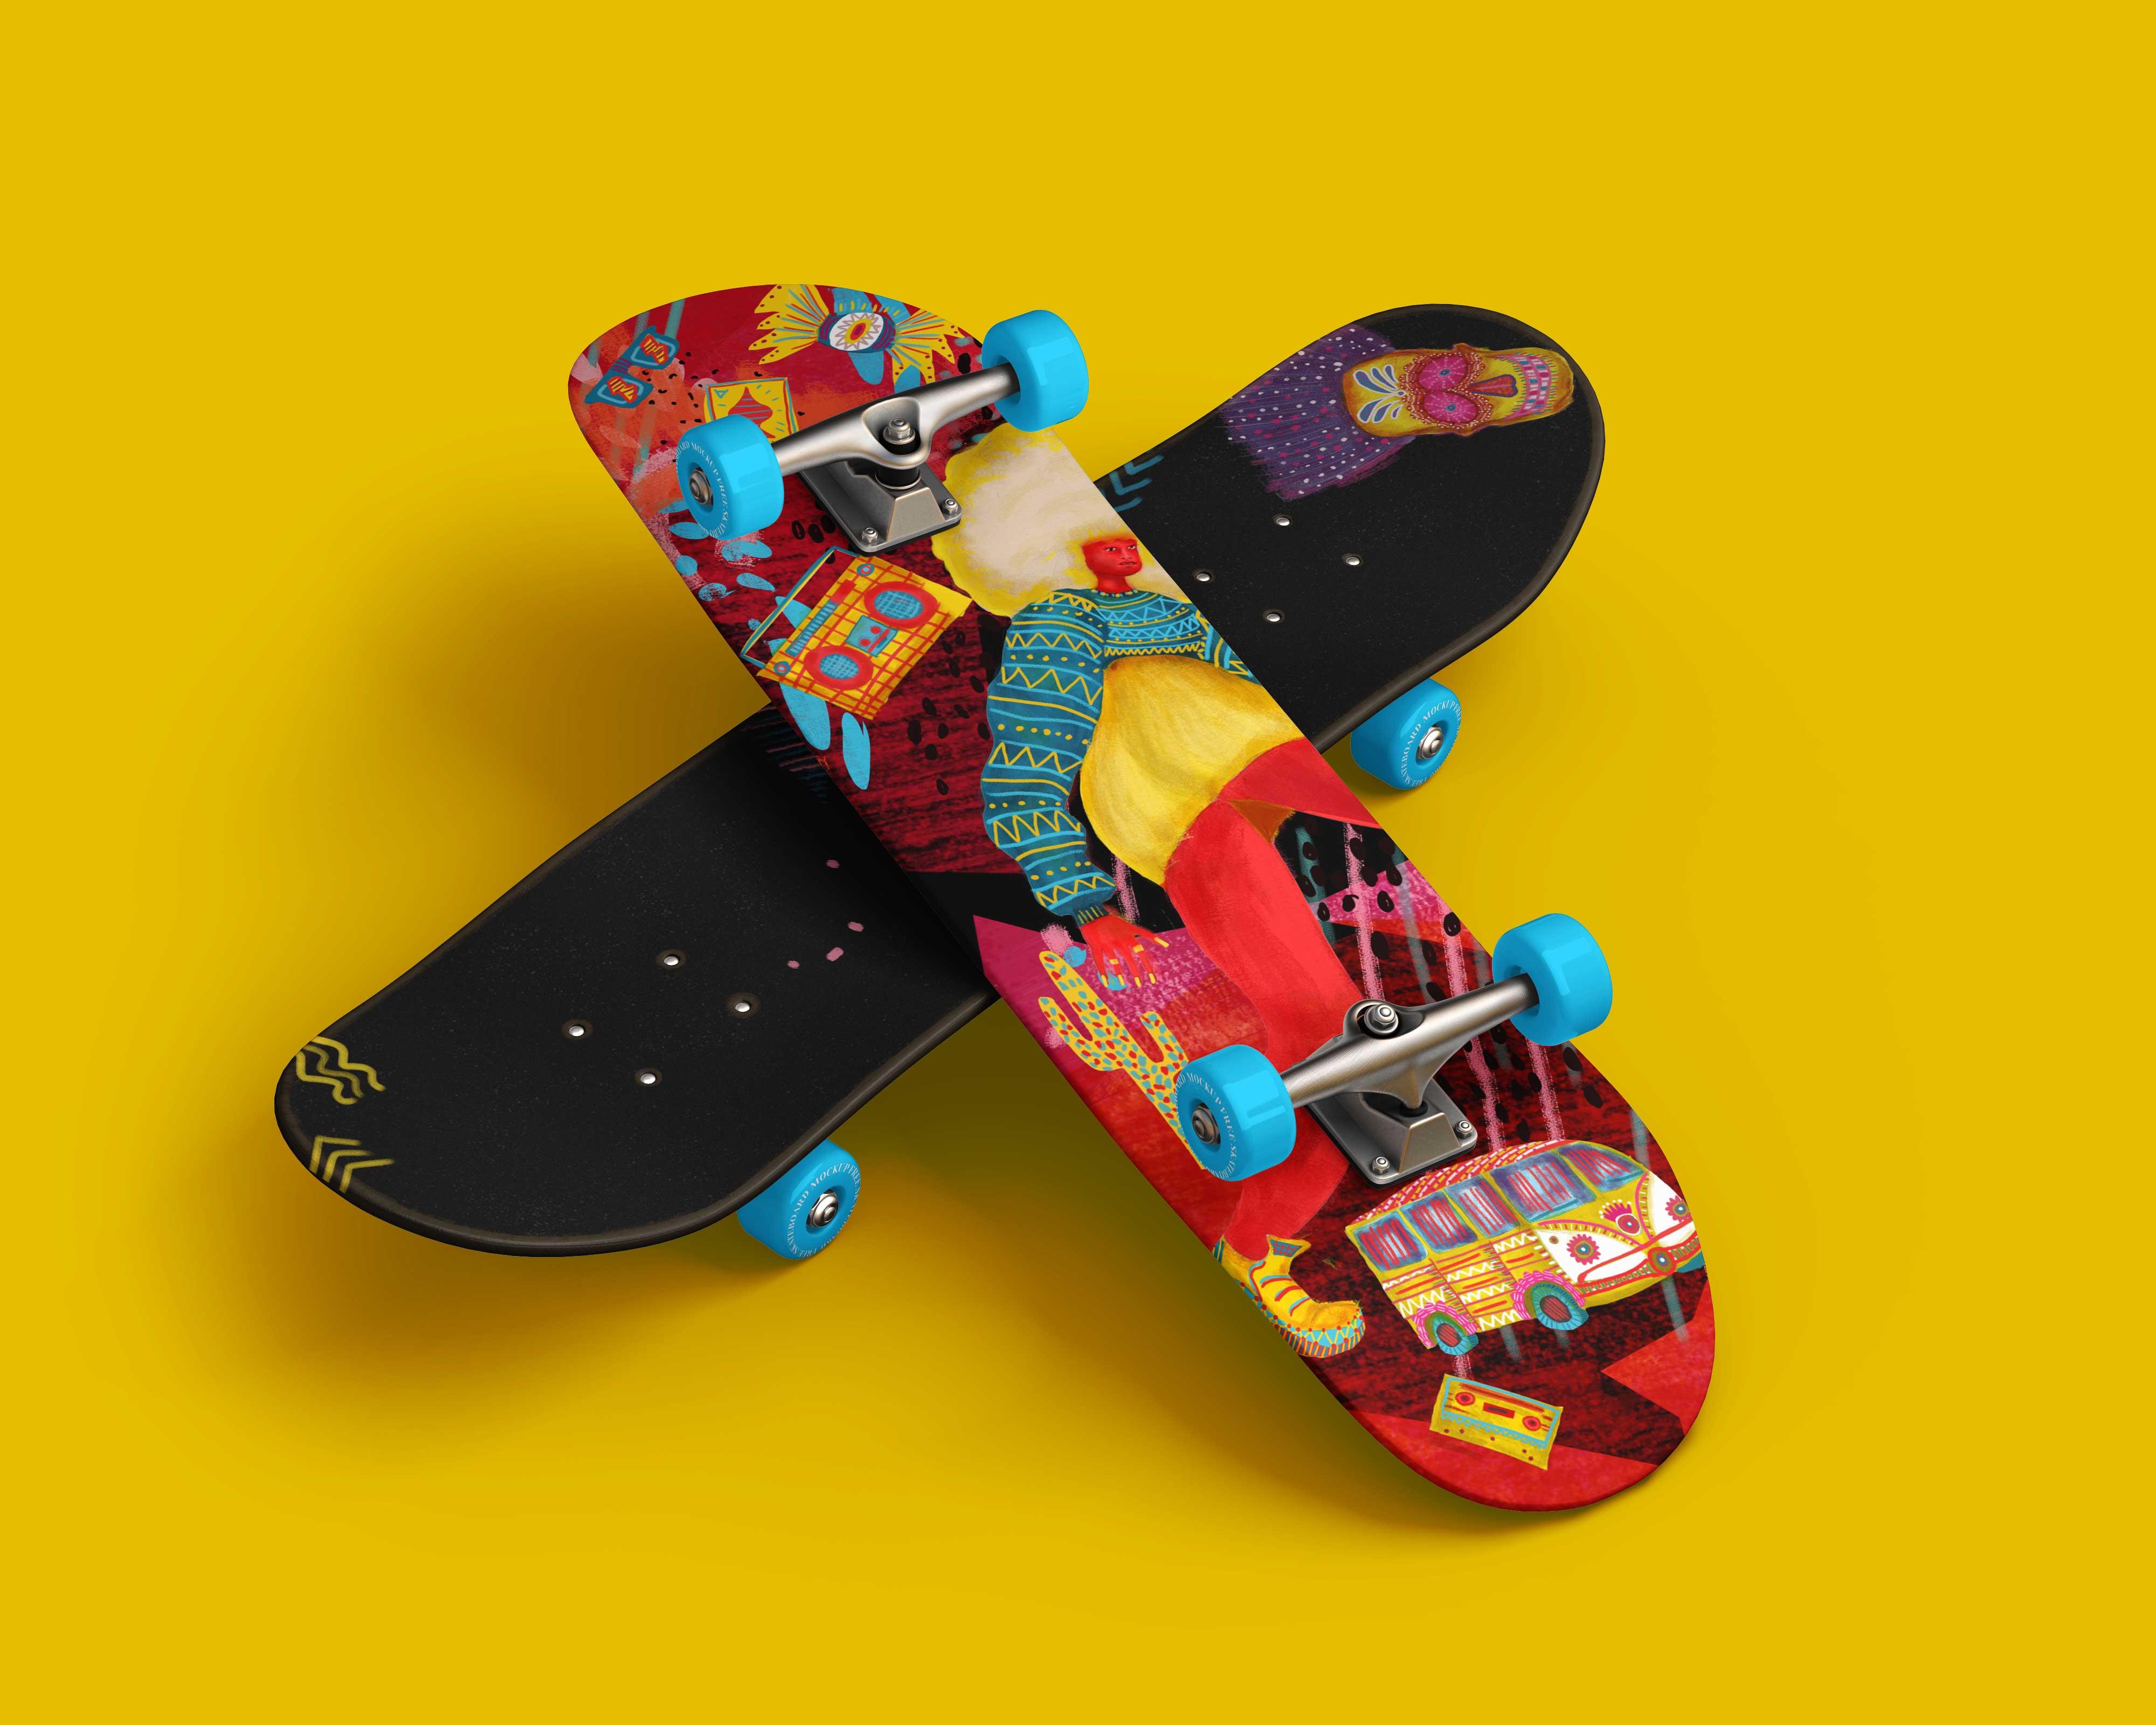 Skateboard_v01